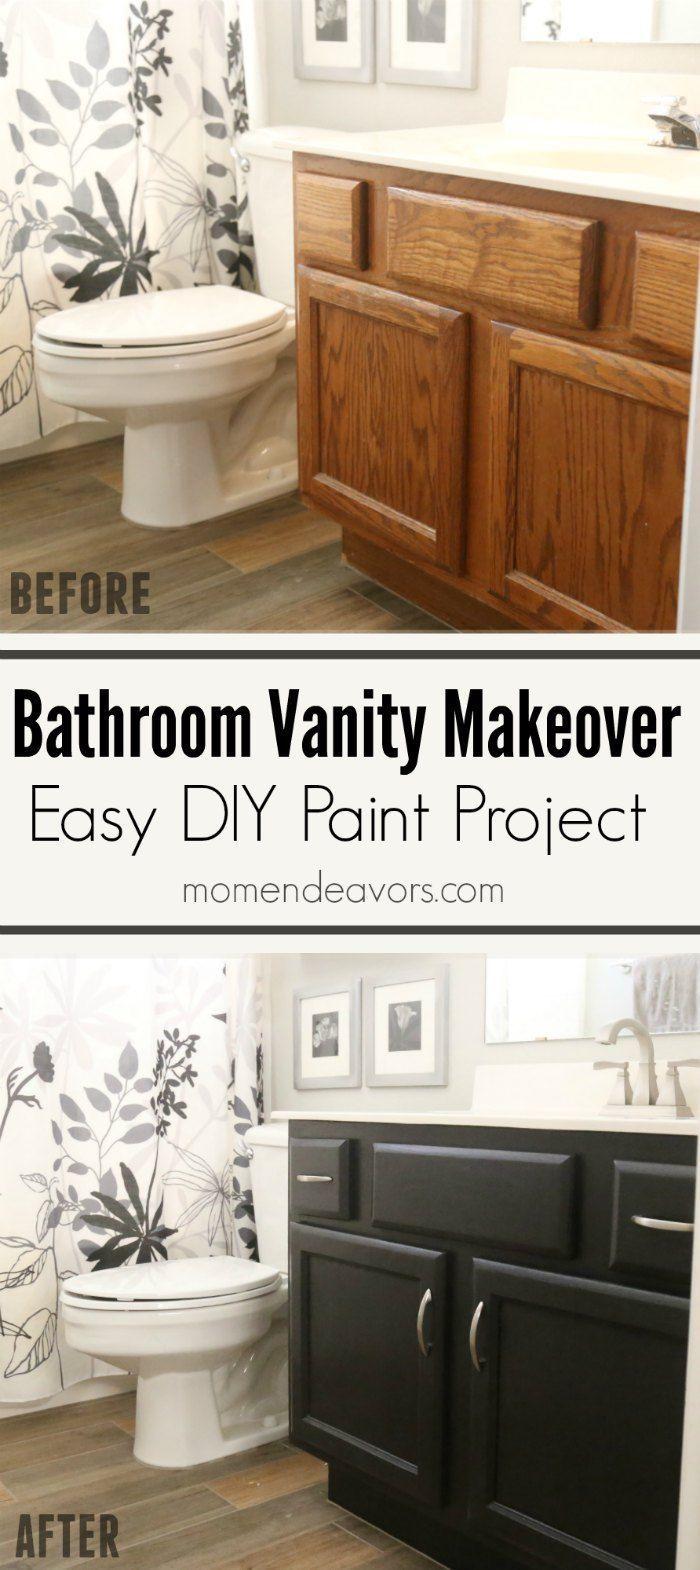 Bathroom Vanity Makeover Easy Diy Home Paint Project Mom Endeavors In 2021 Bathroom Vanity Makeover Bathroom Cabinet Makeover Vanity Makeover